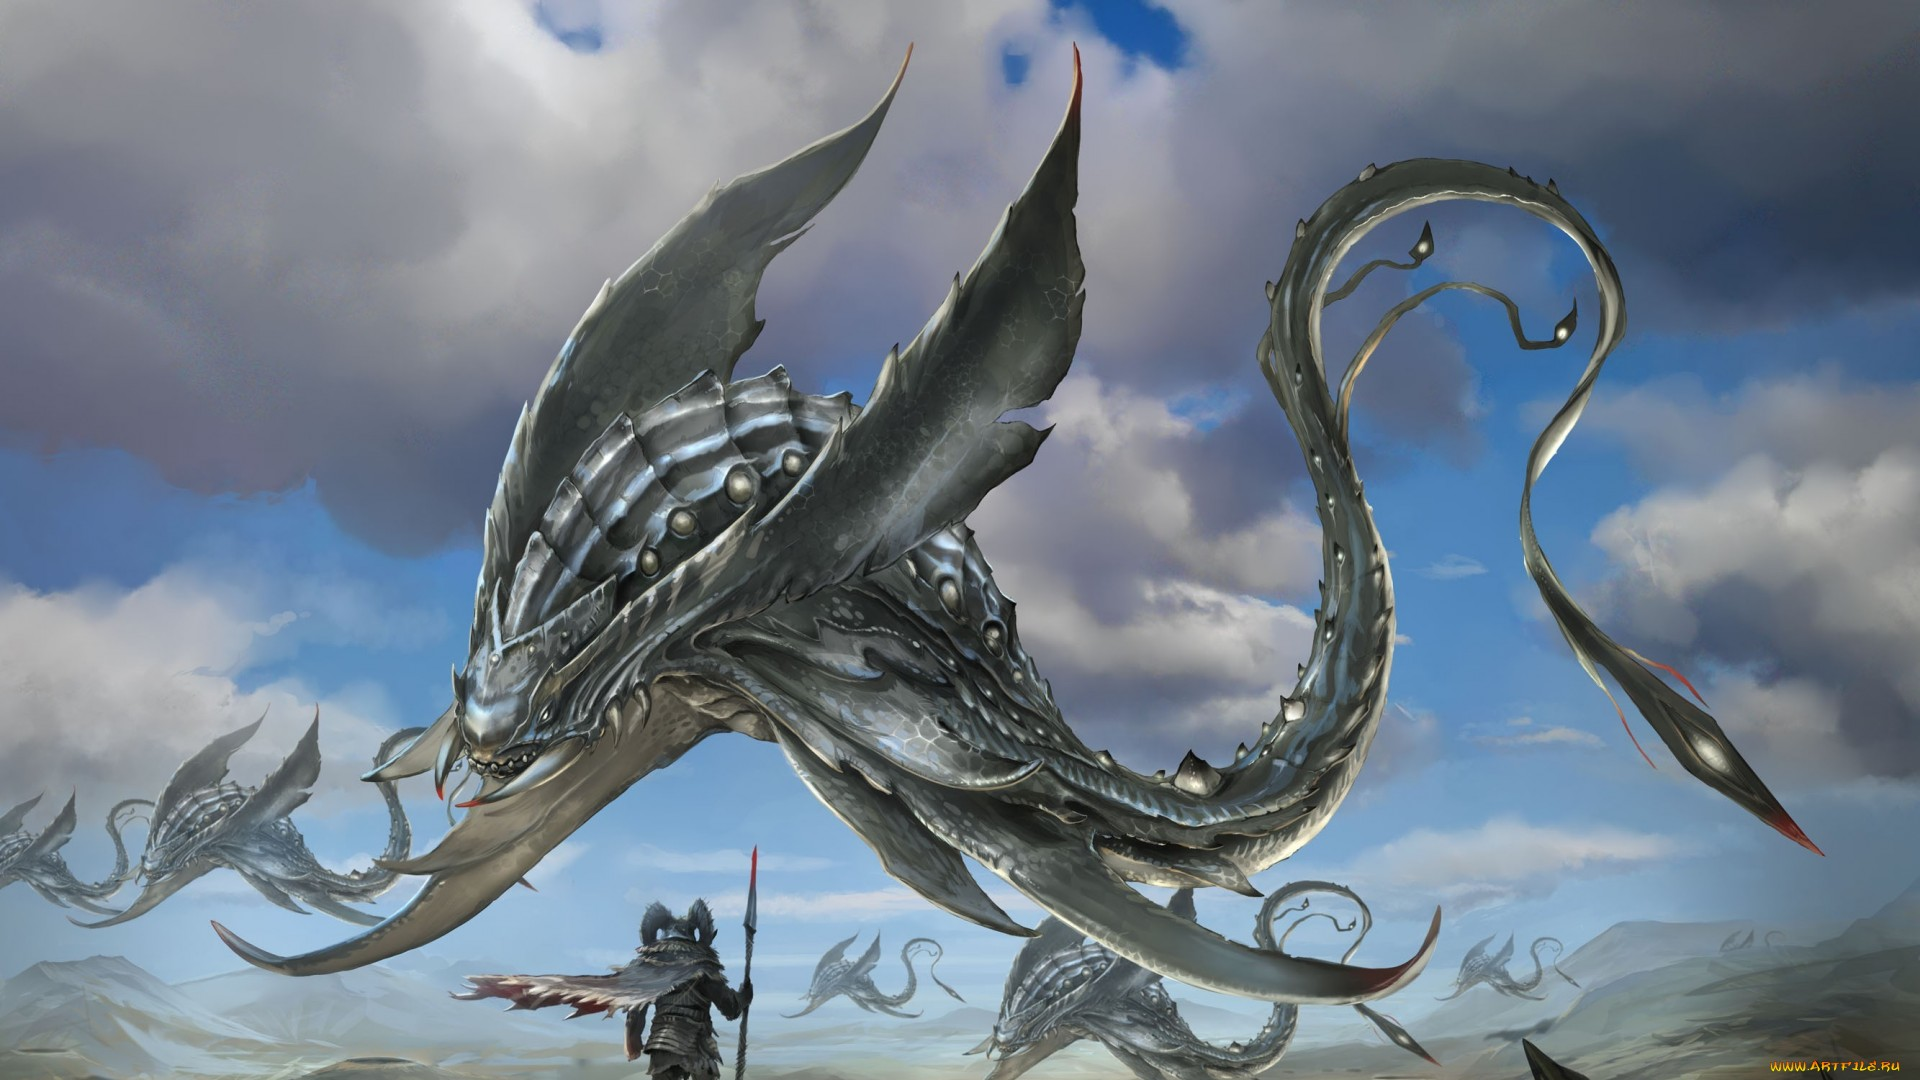 training fantasy creature animated wallpaper